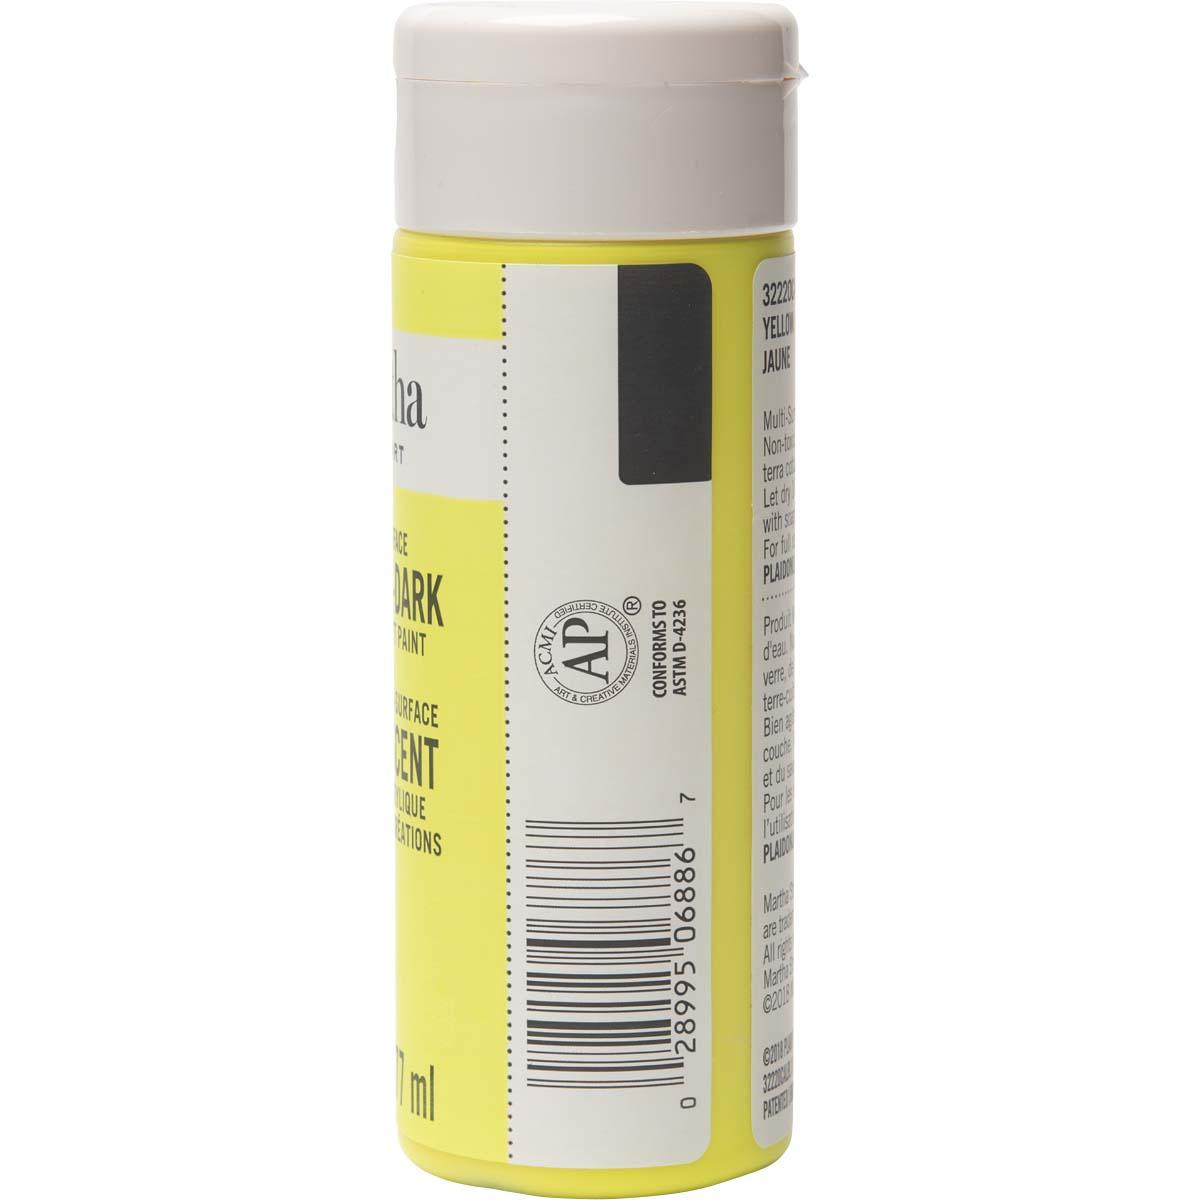 Martha Stewart ® Multi-Surface Glow-in-the-Dark Acrylic Craft Paint - Yellow, 6 oz. - 32220CA